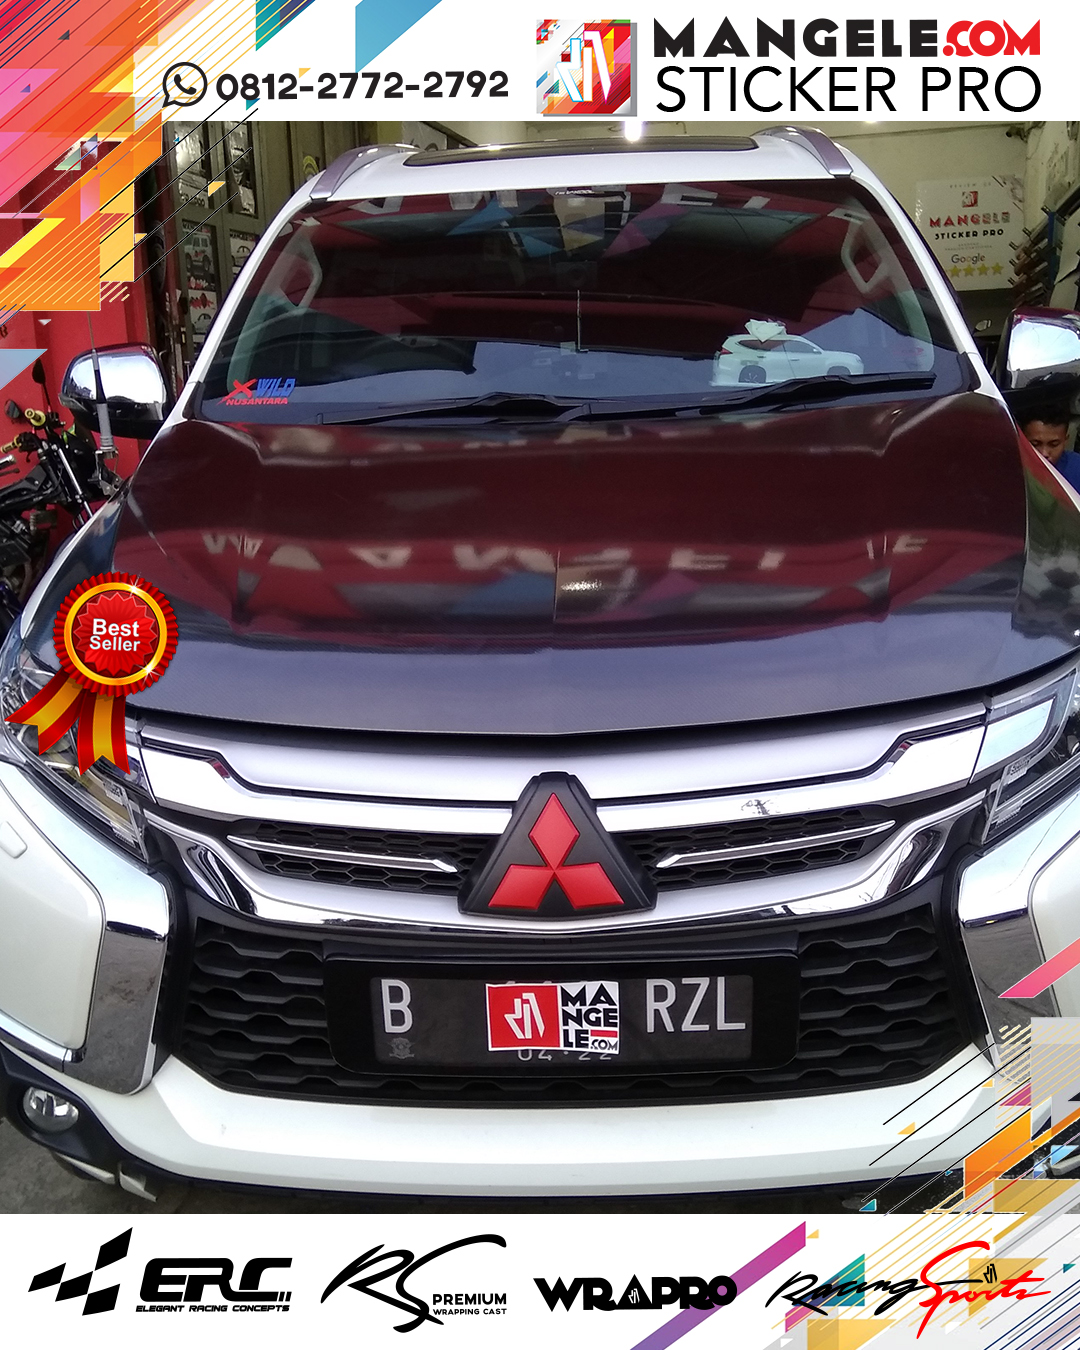 wrapping stiker mobil | Pajero Kap Mesin Carbon | mangele stiker 081227722792